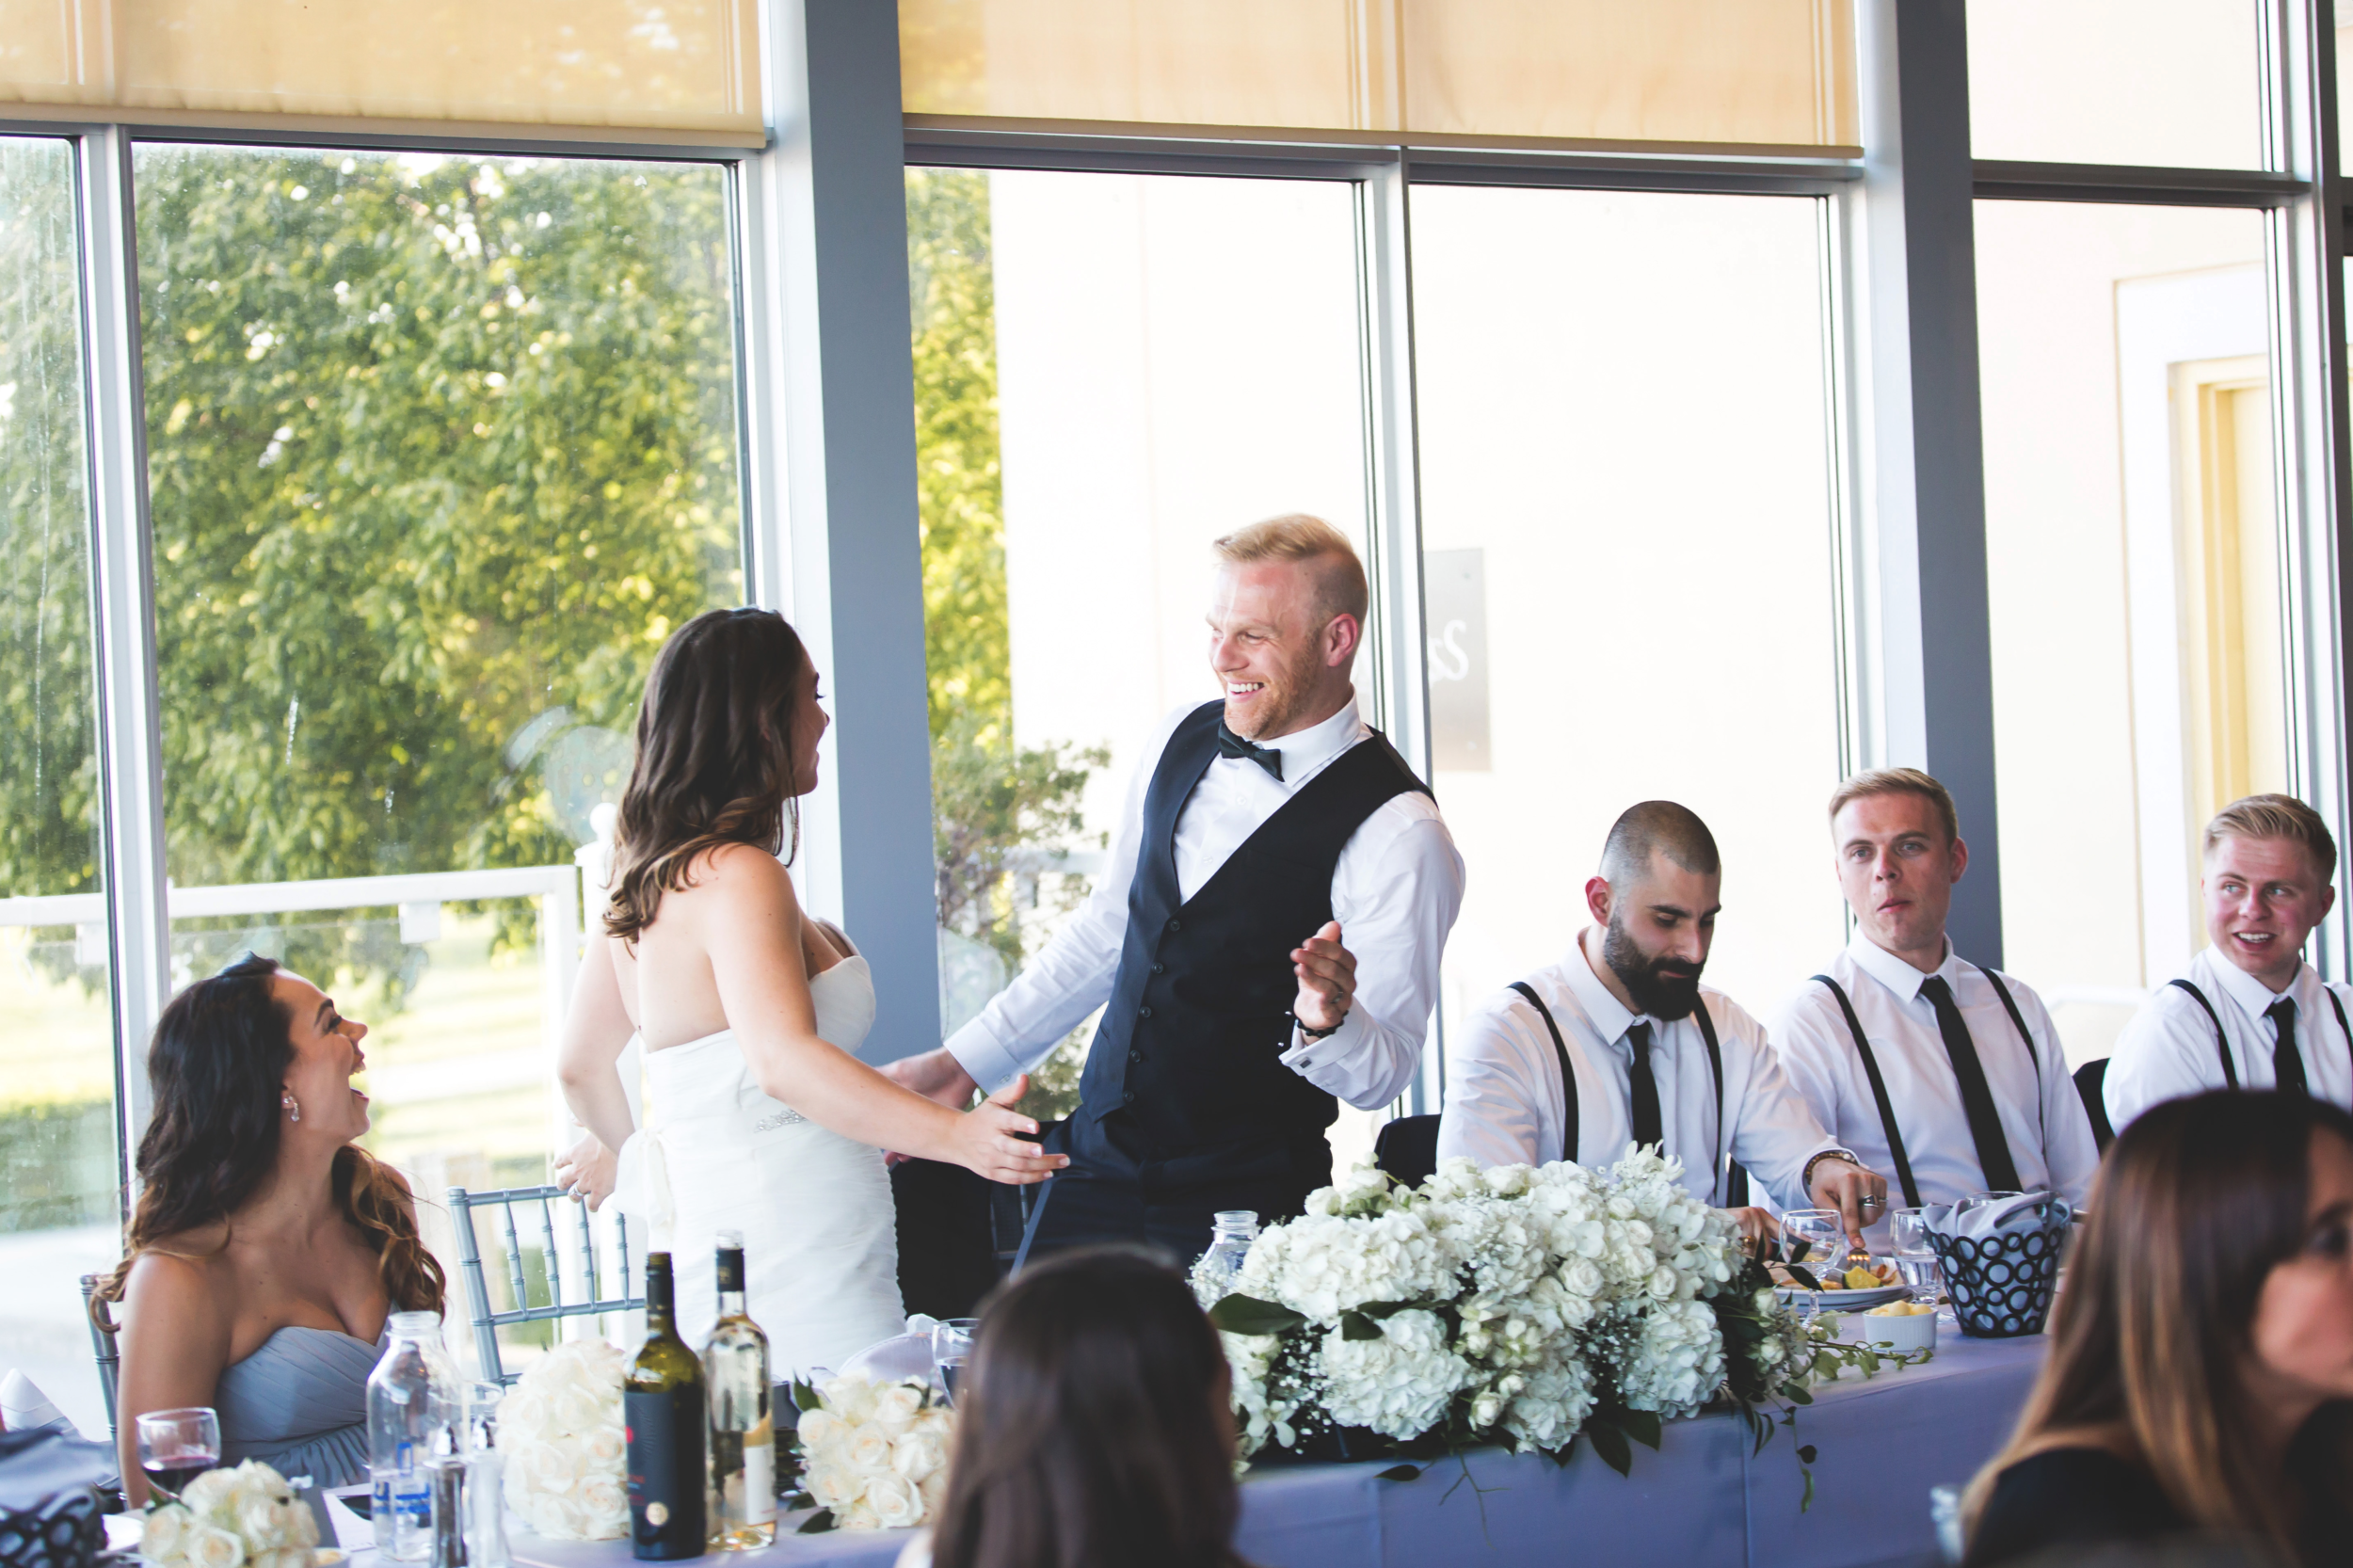 Wedding-Harbour-Banquet-Center-Oakville-Photographer-Wedding-Hamilton-Saint-James-Espresso-Downtown-HamOnt-GTA-Niagara-Toronto-Moments-by-Lauren-Photography-Photo-Image-62.png